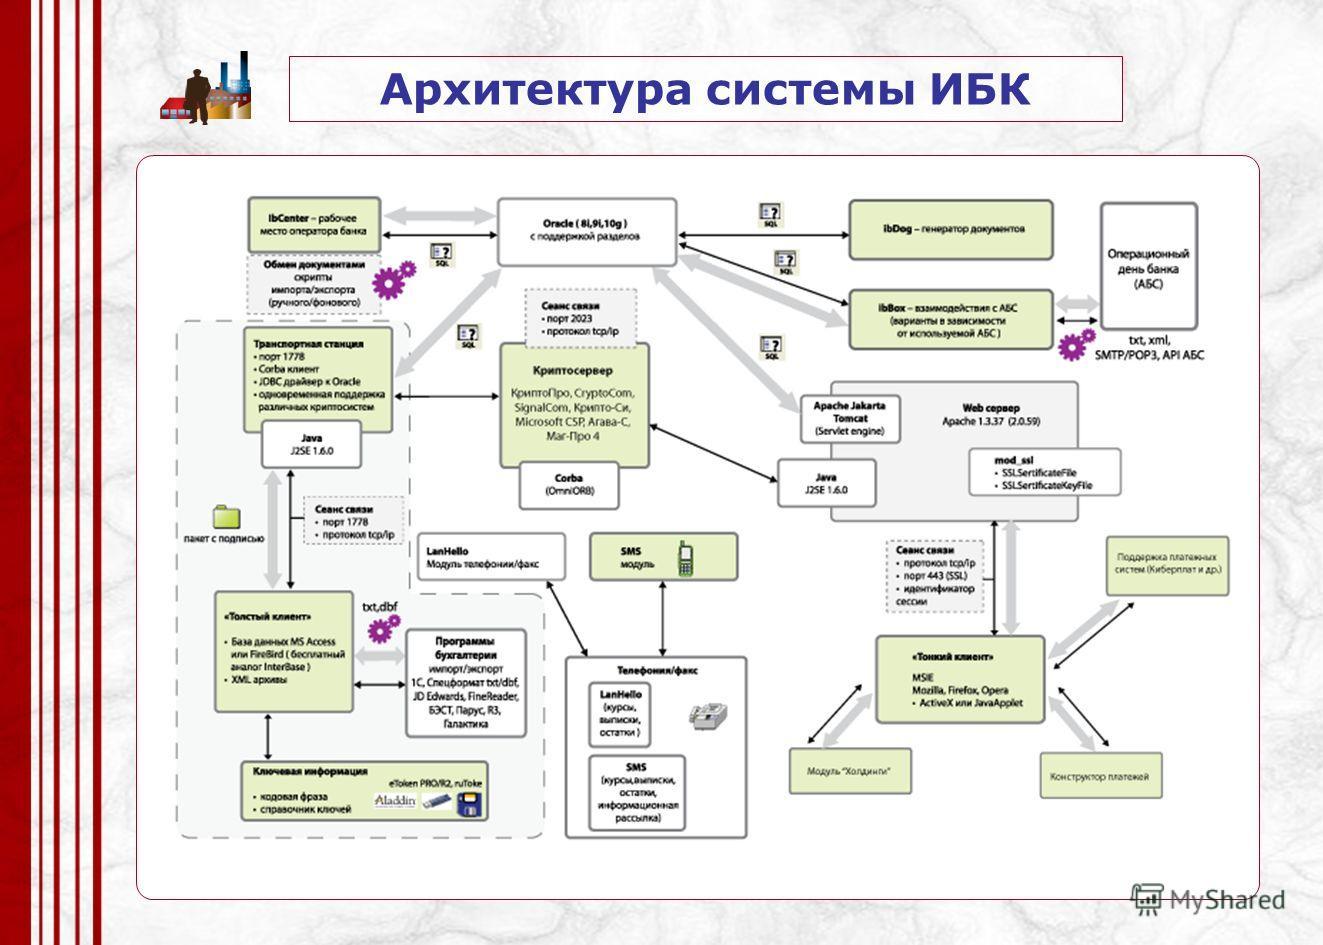 Архитектура системы ИБК